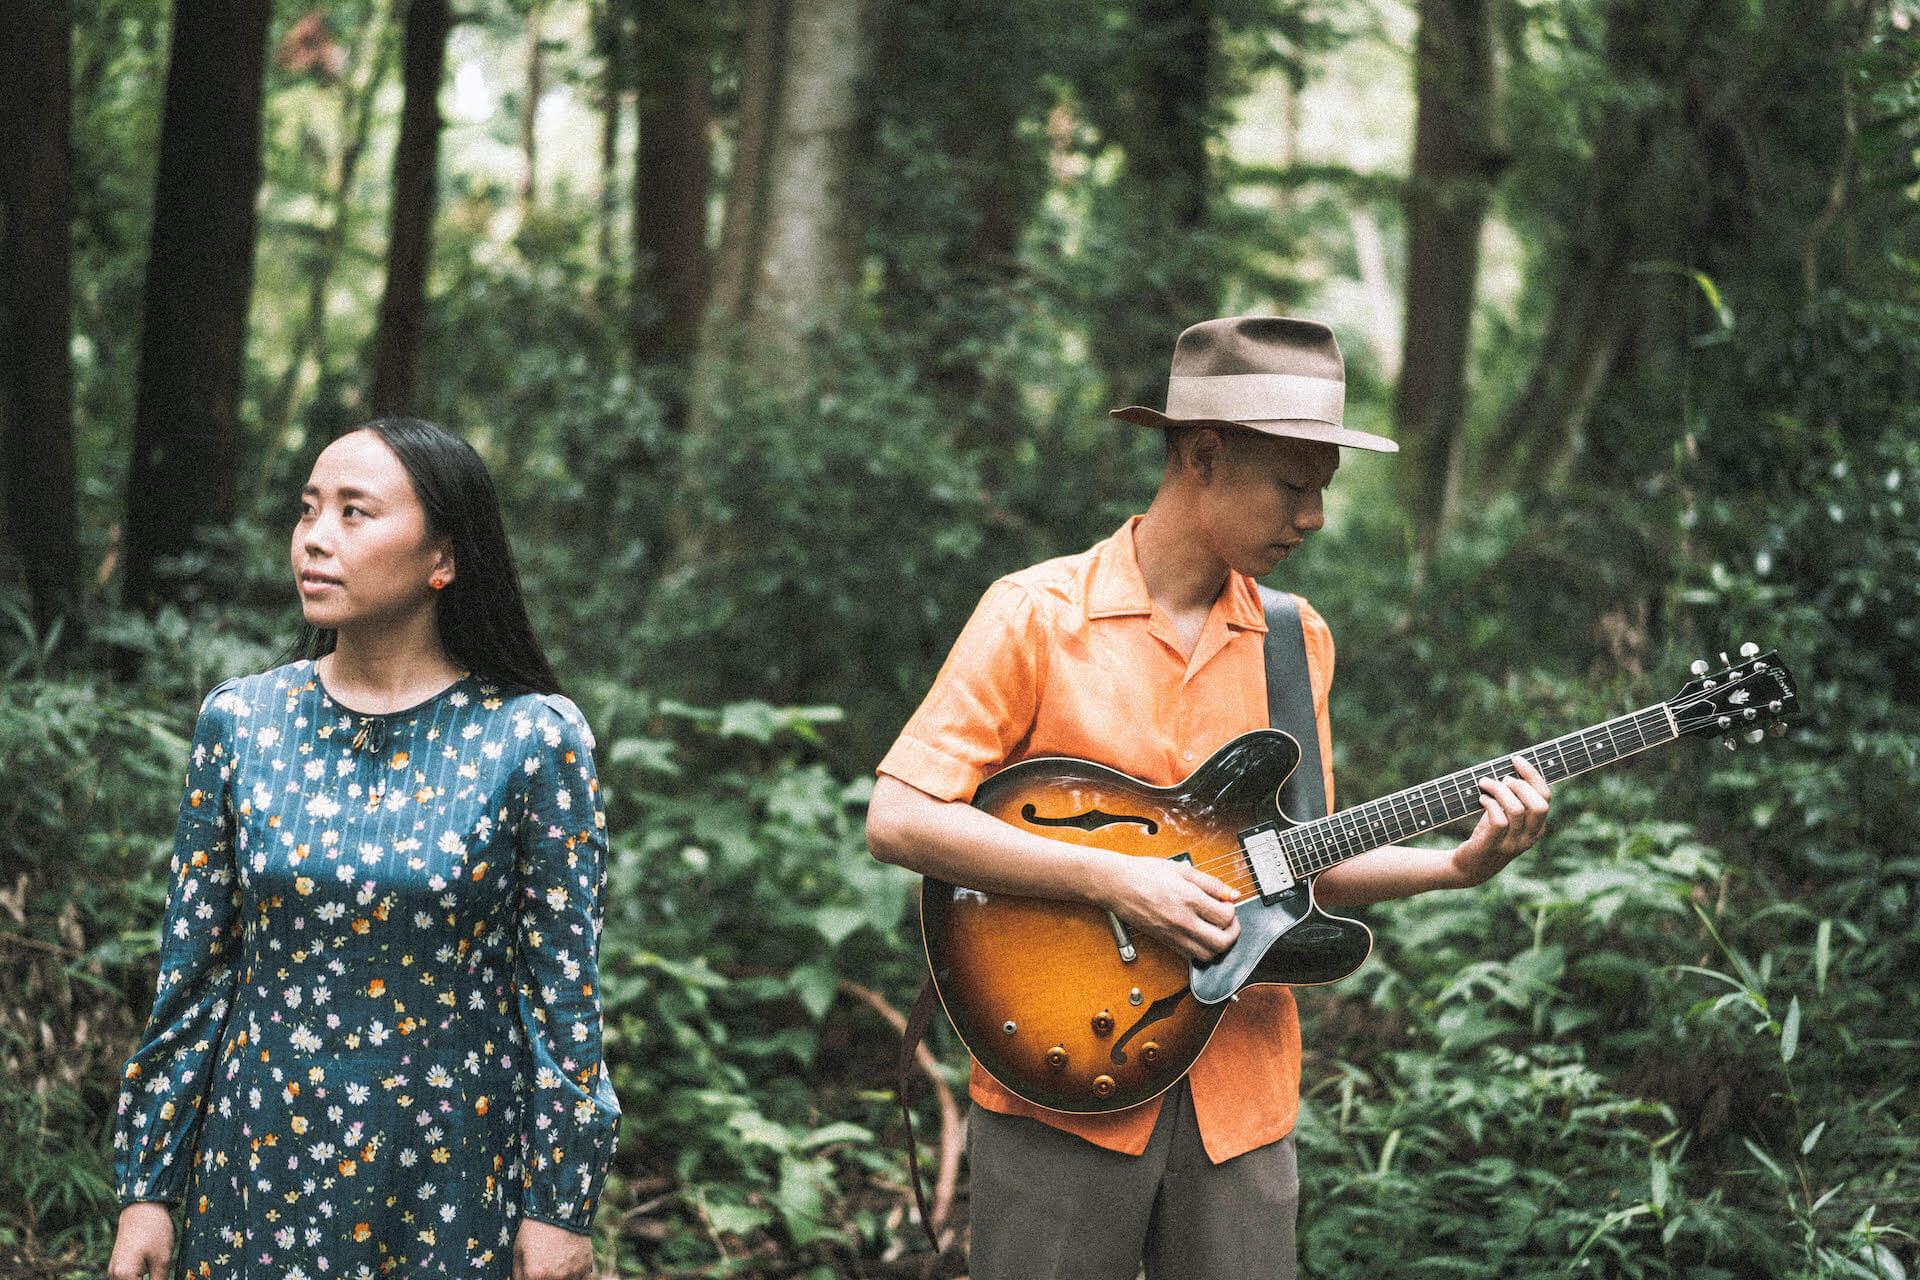 Shoko & The Akillaのファースト・アルバム『Shoko & The Akilla』が待望の初LP化|BUSHMINDのリミックスも収録 music210426-shoko-theakilla-1